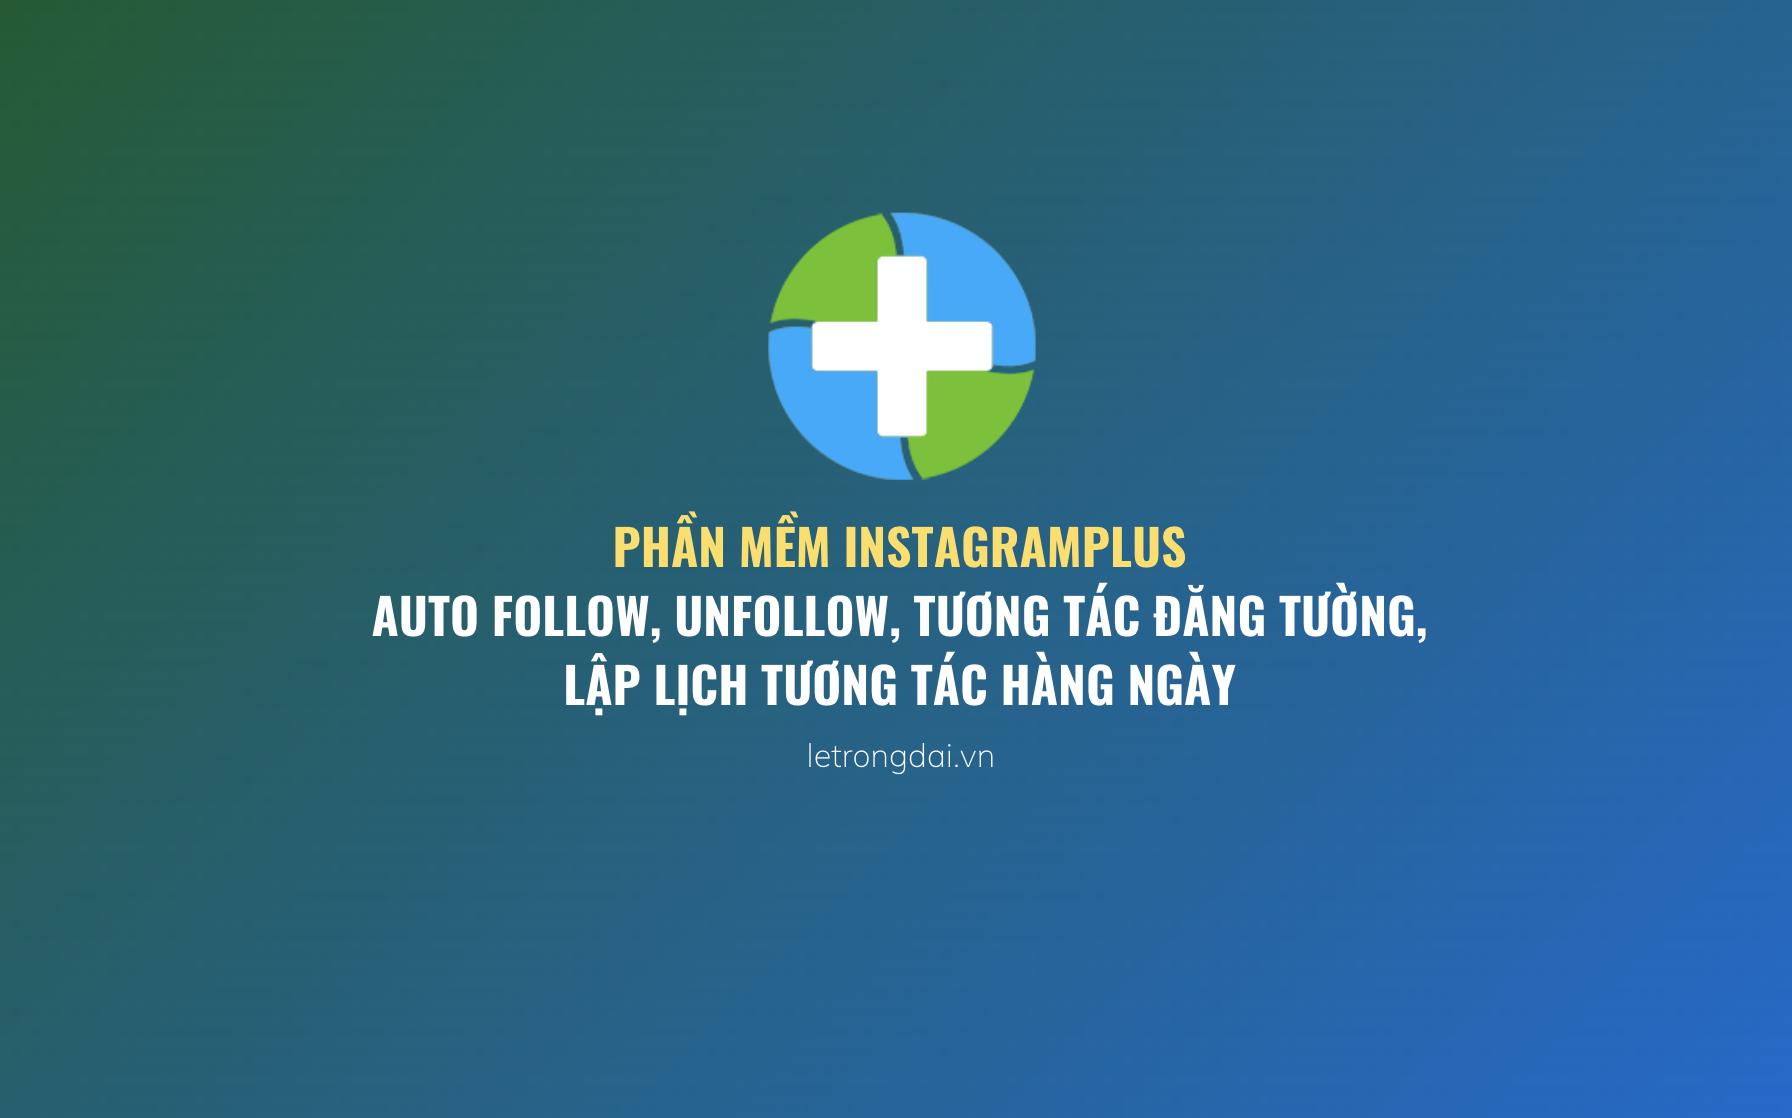 Phần Mềm Instagramplus